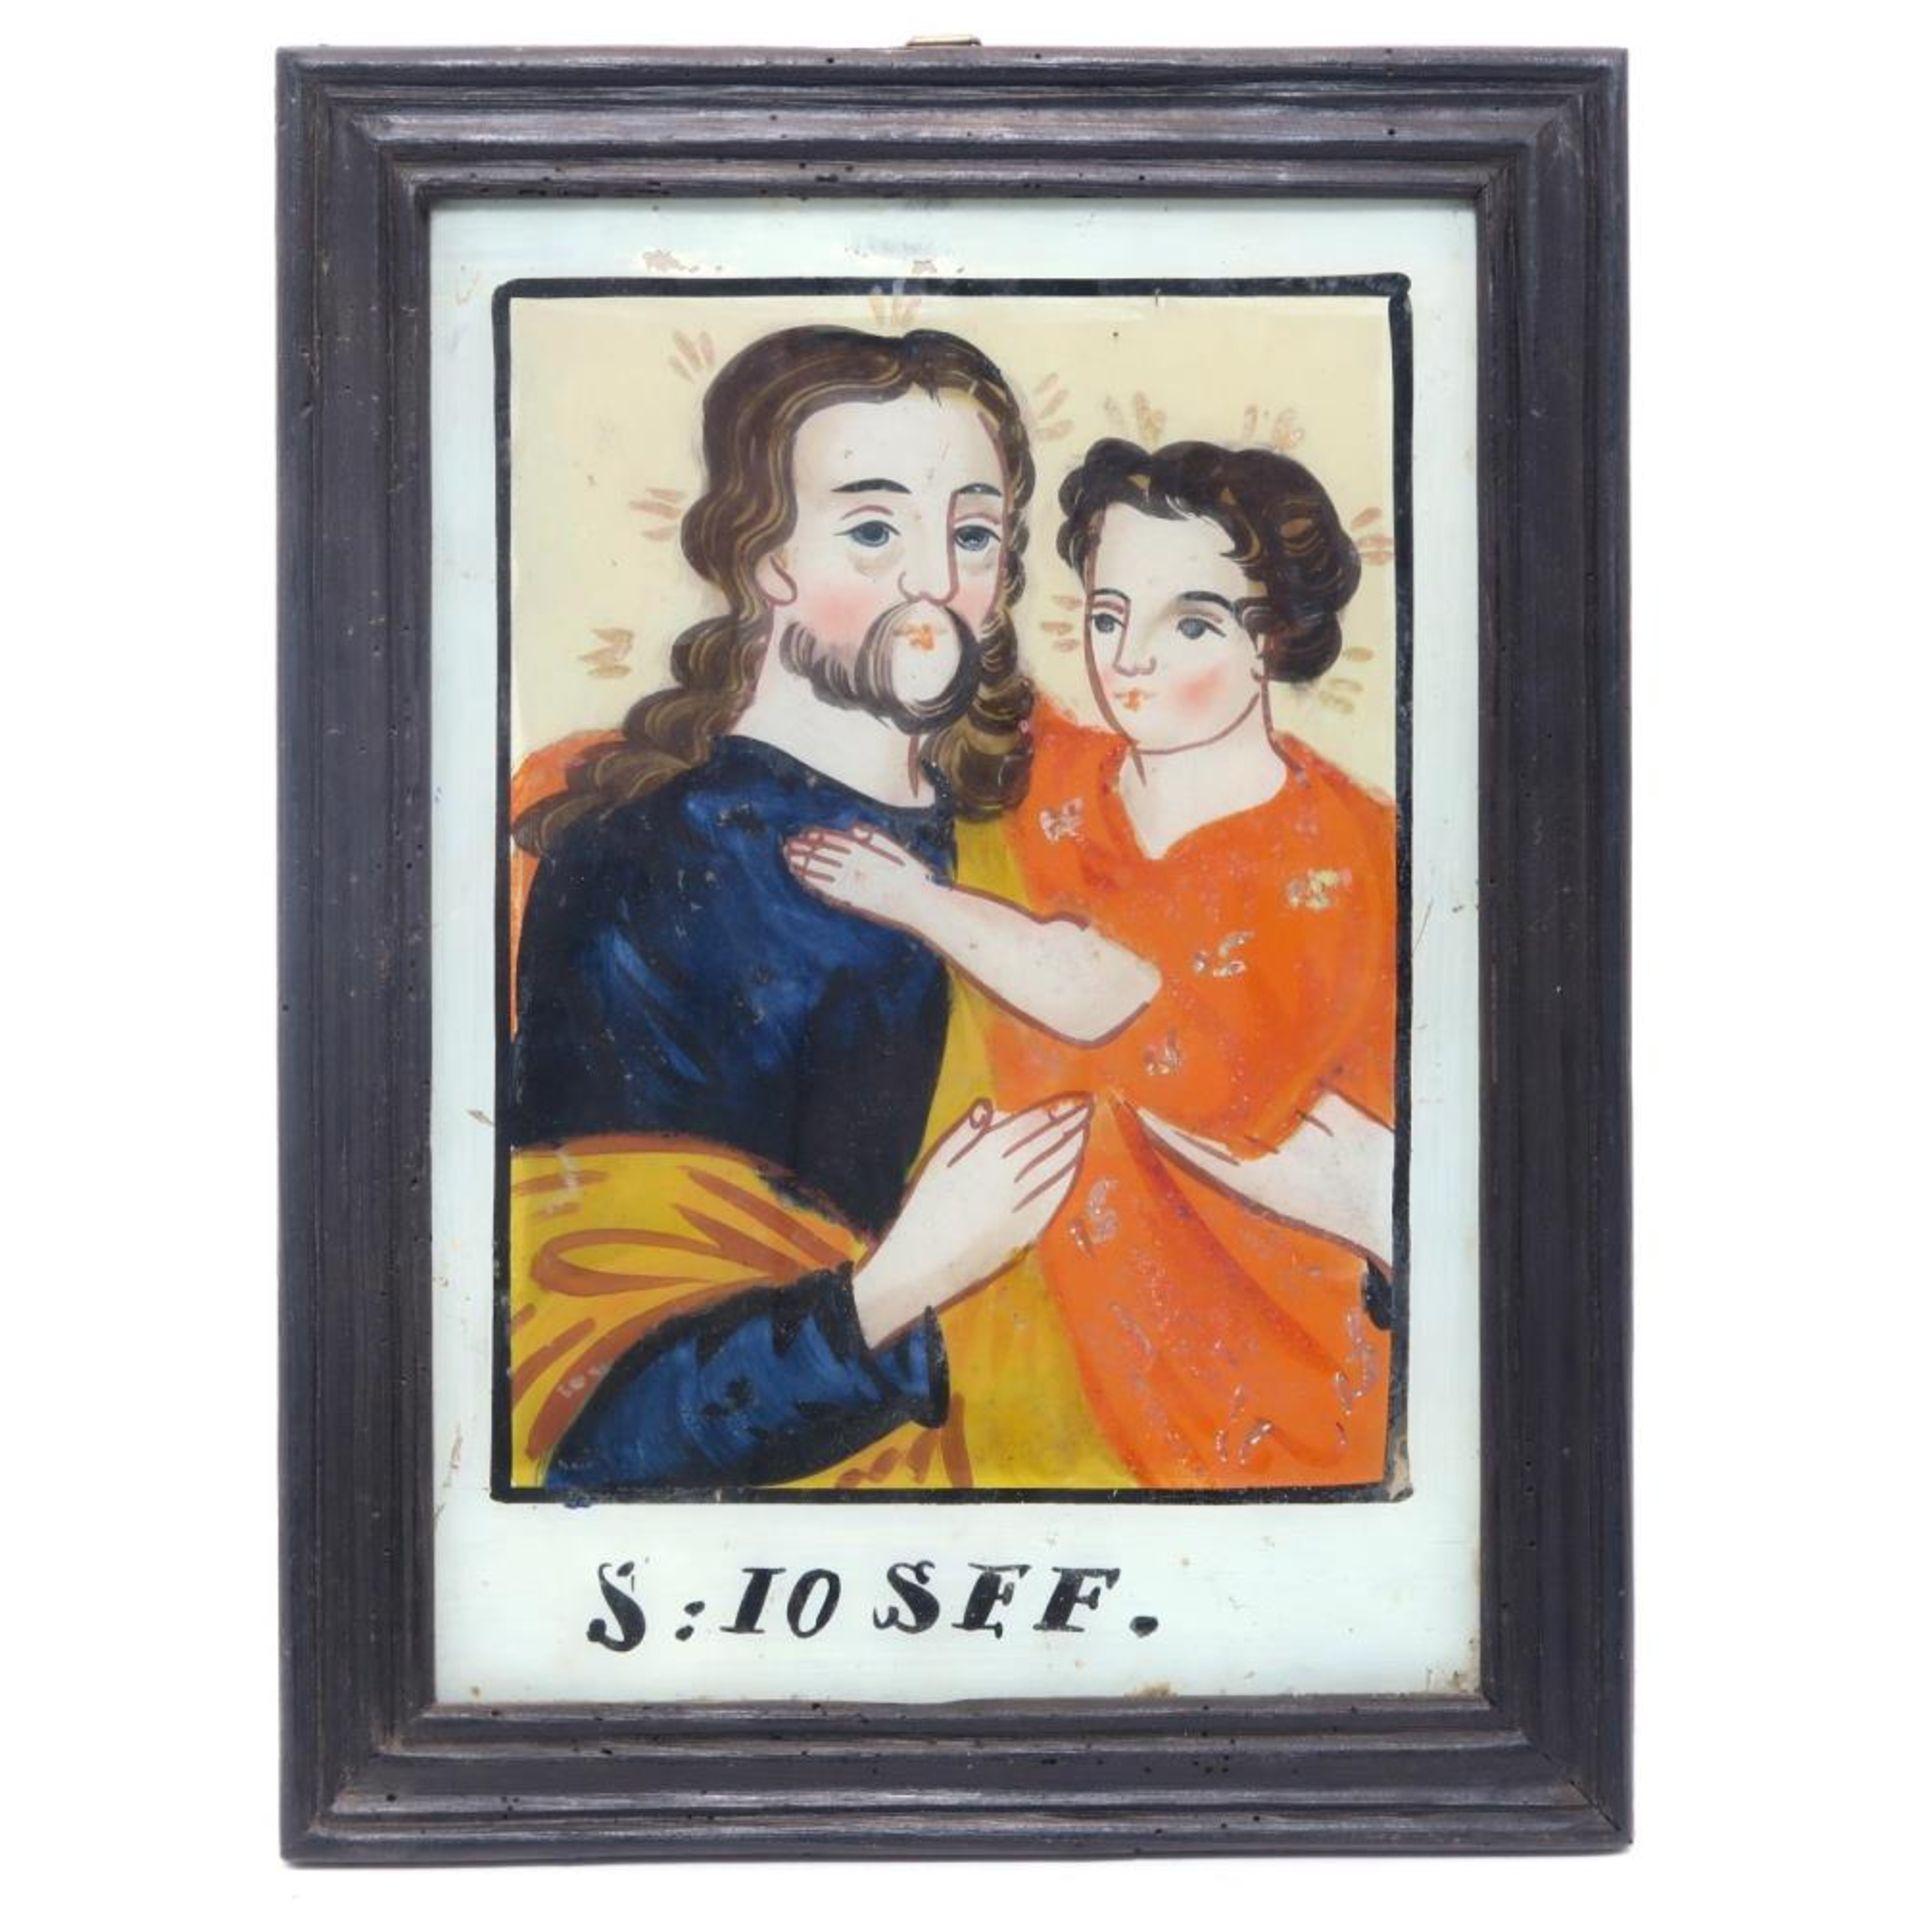 Hinterglasbild: Hl. Josef mit Christuskind